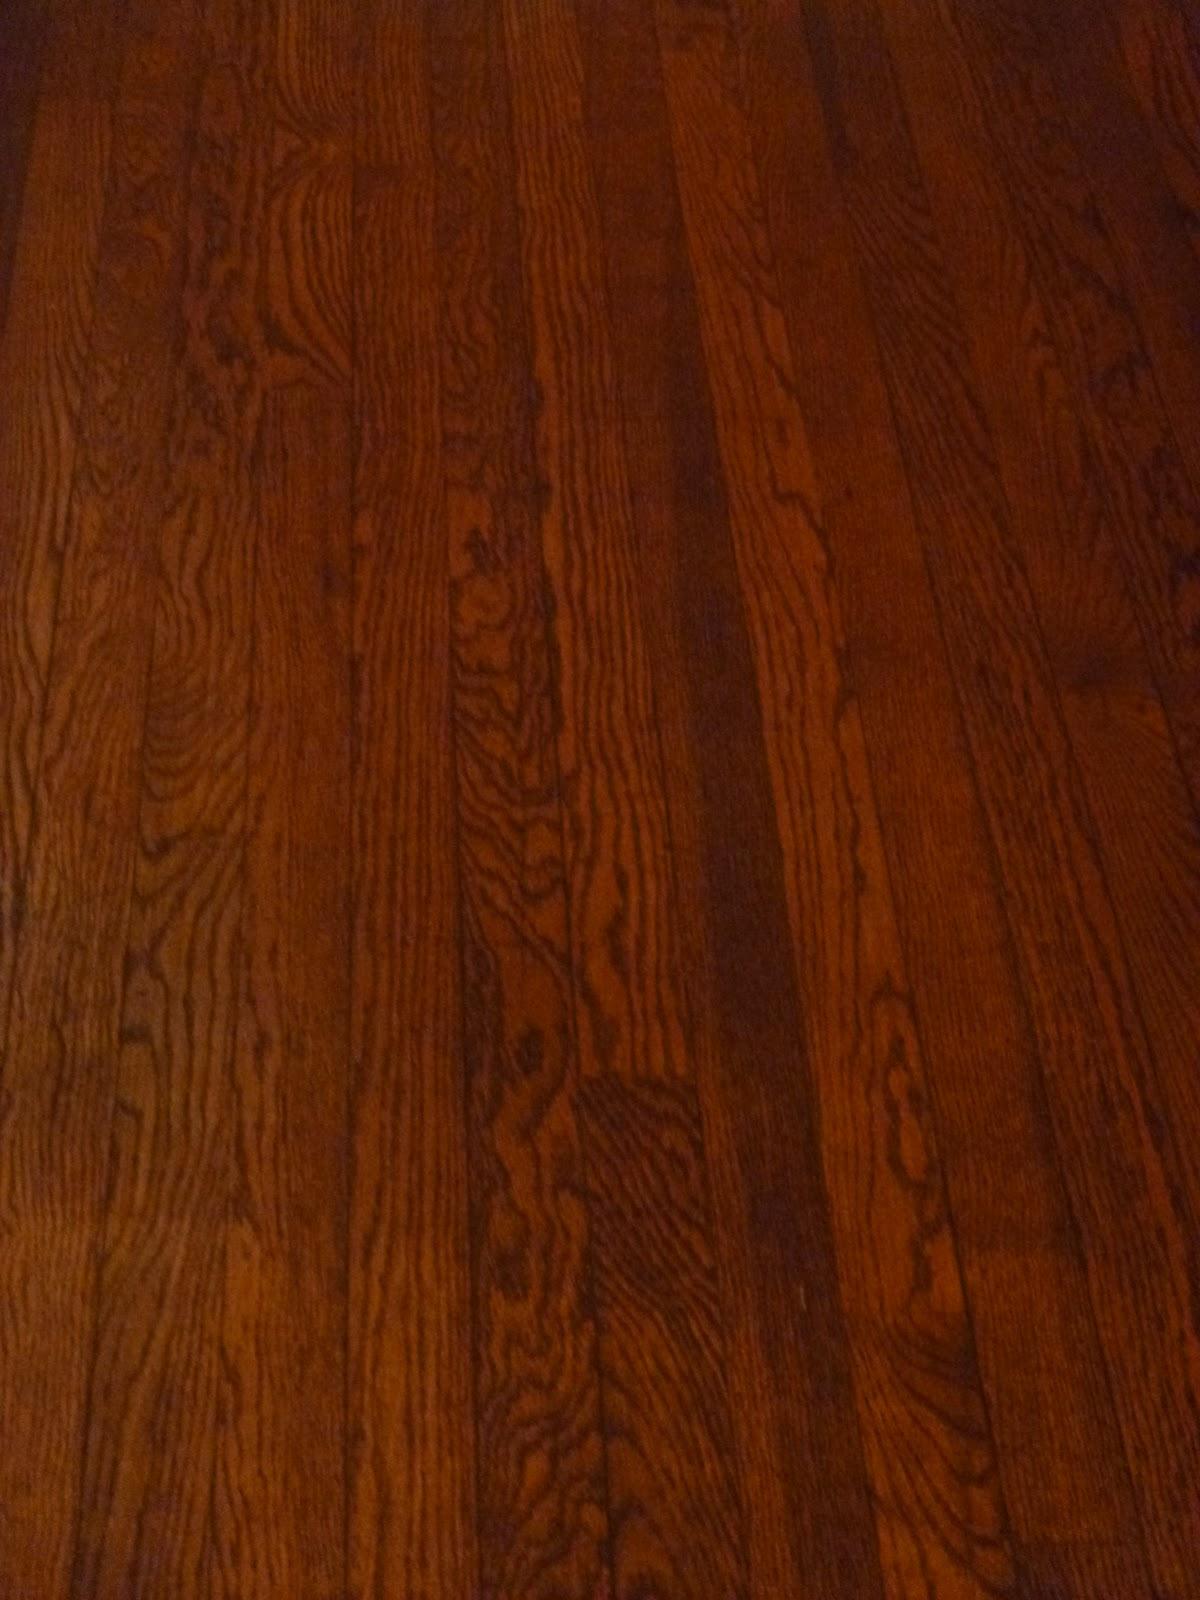 Pine Flooring: Pine Flooring Stained Dark